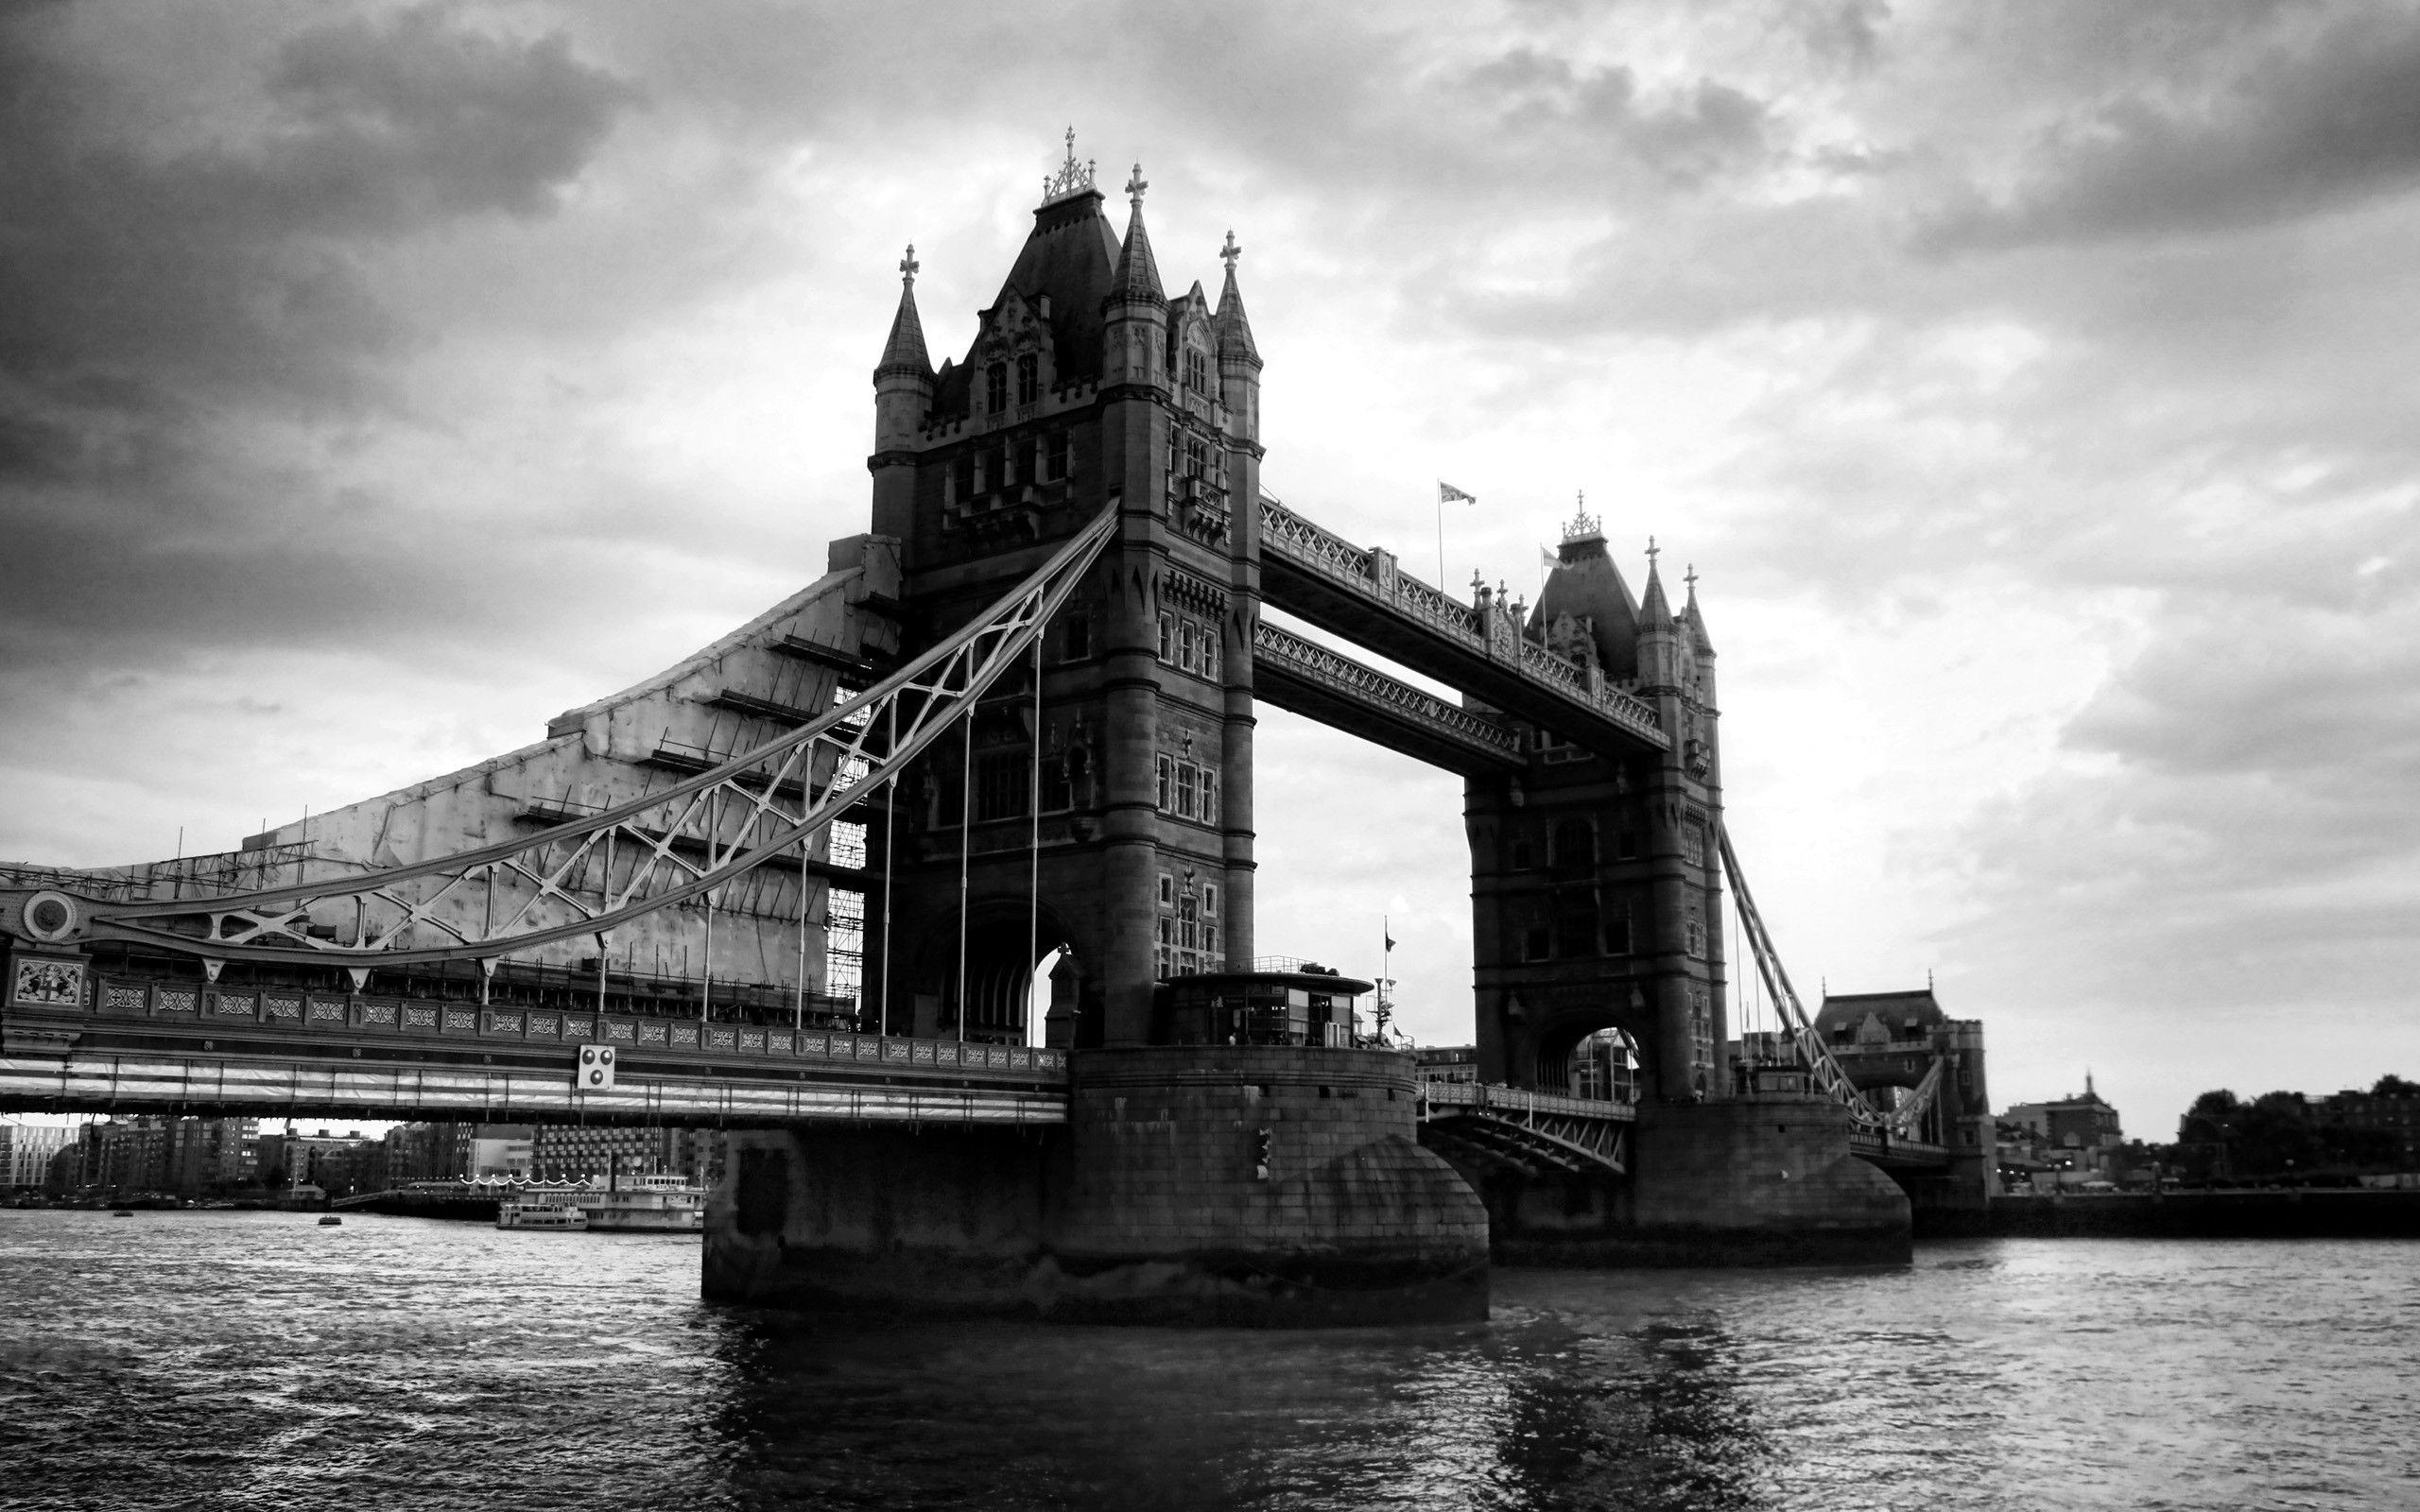 Free Download London Tower Bridge Black And White Hd